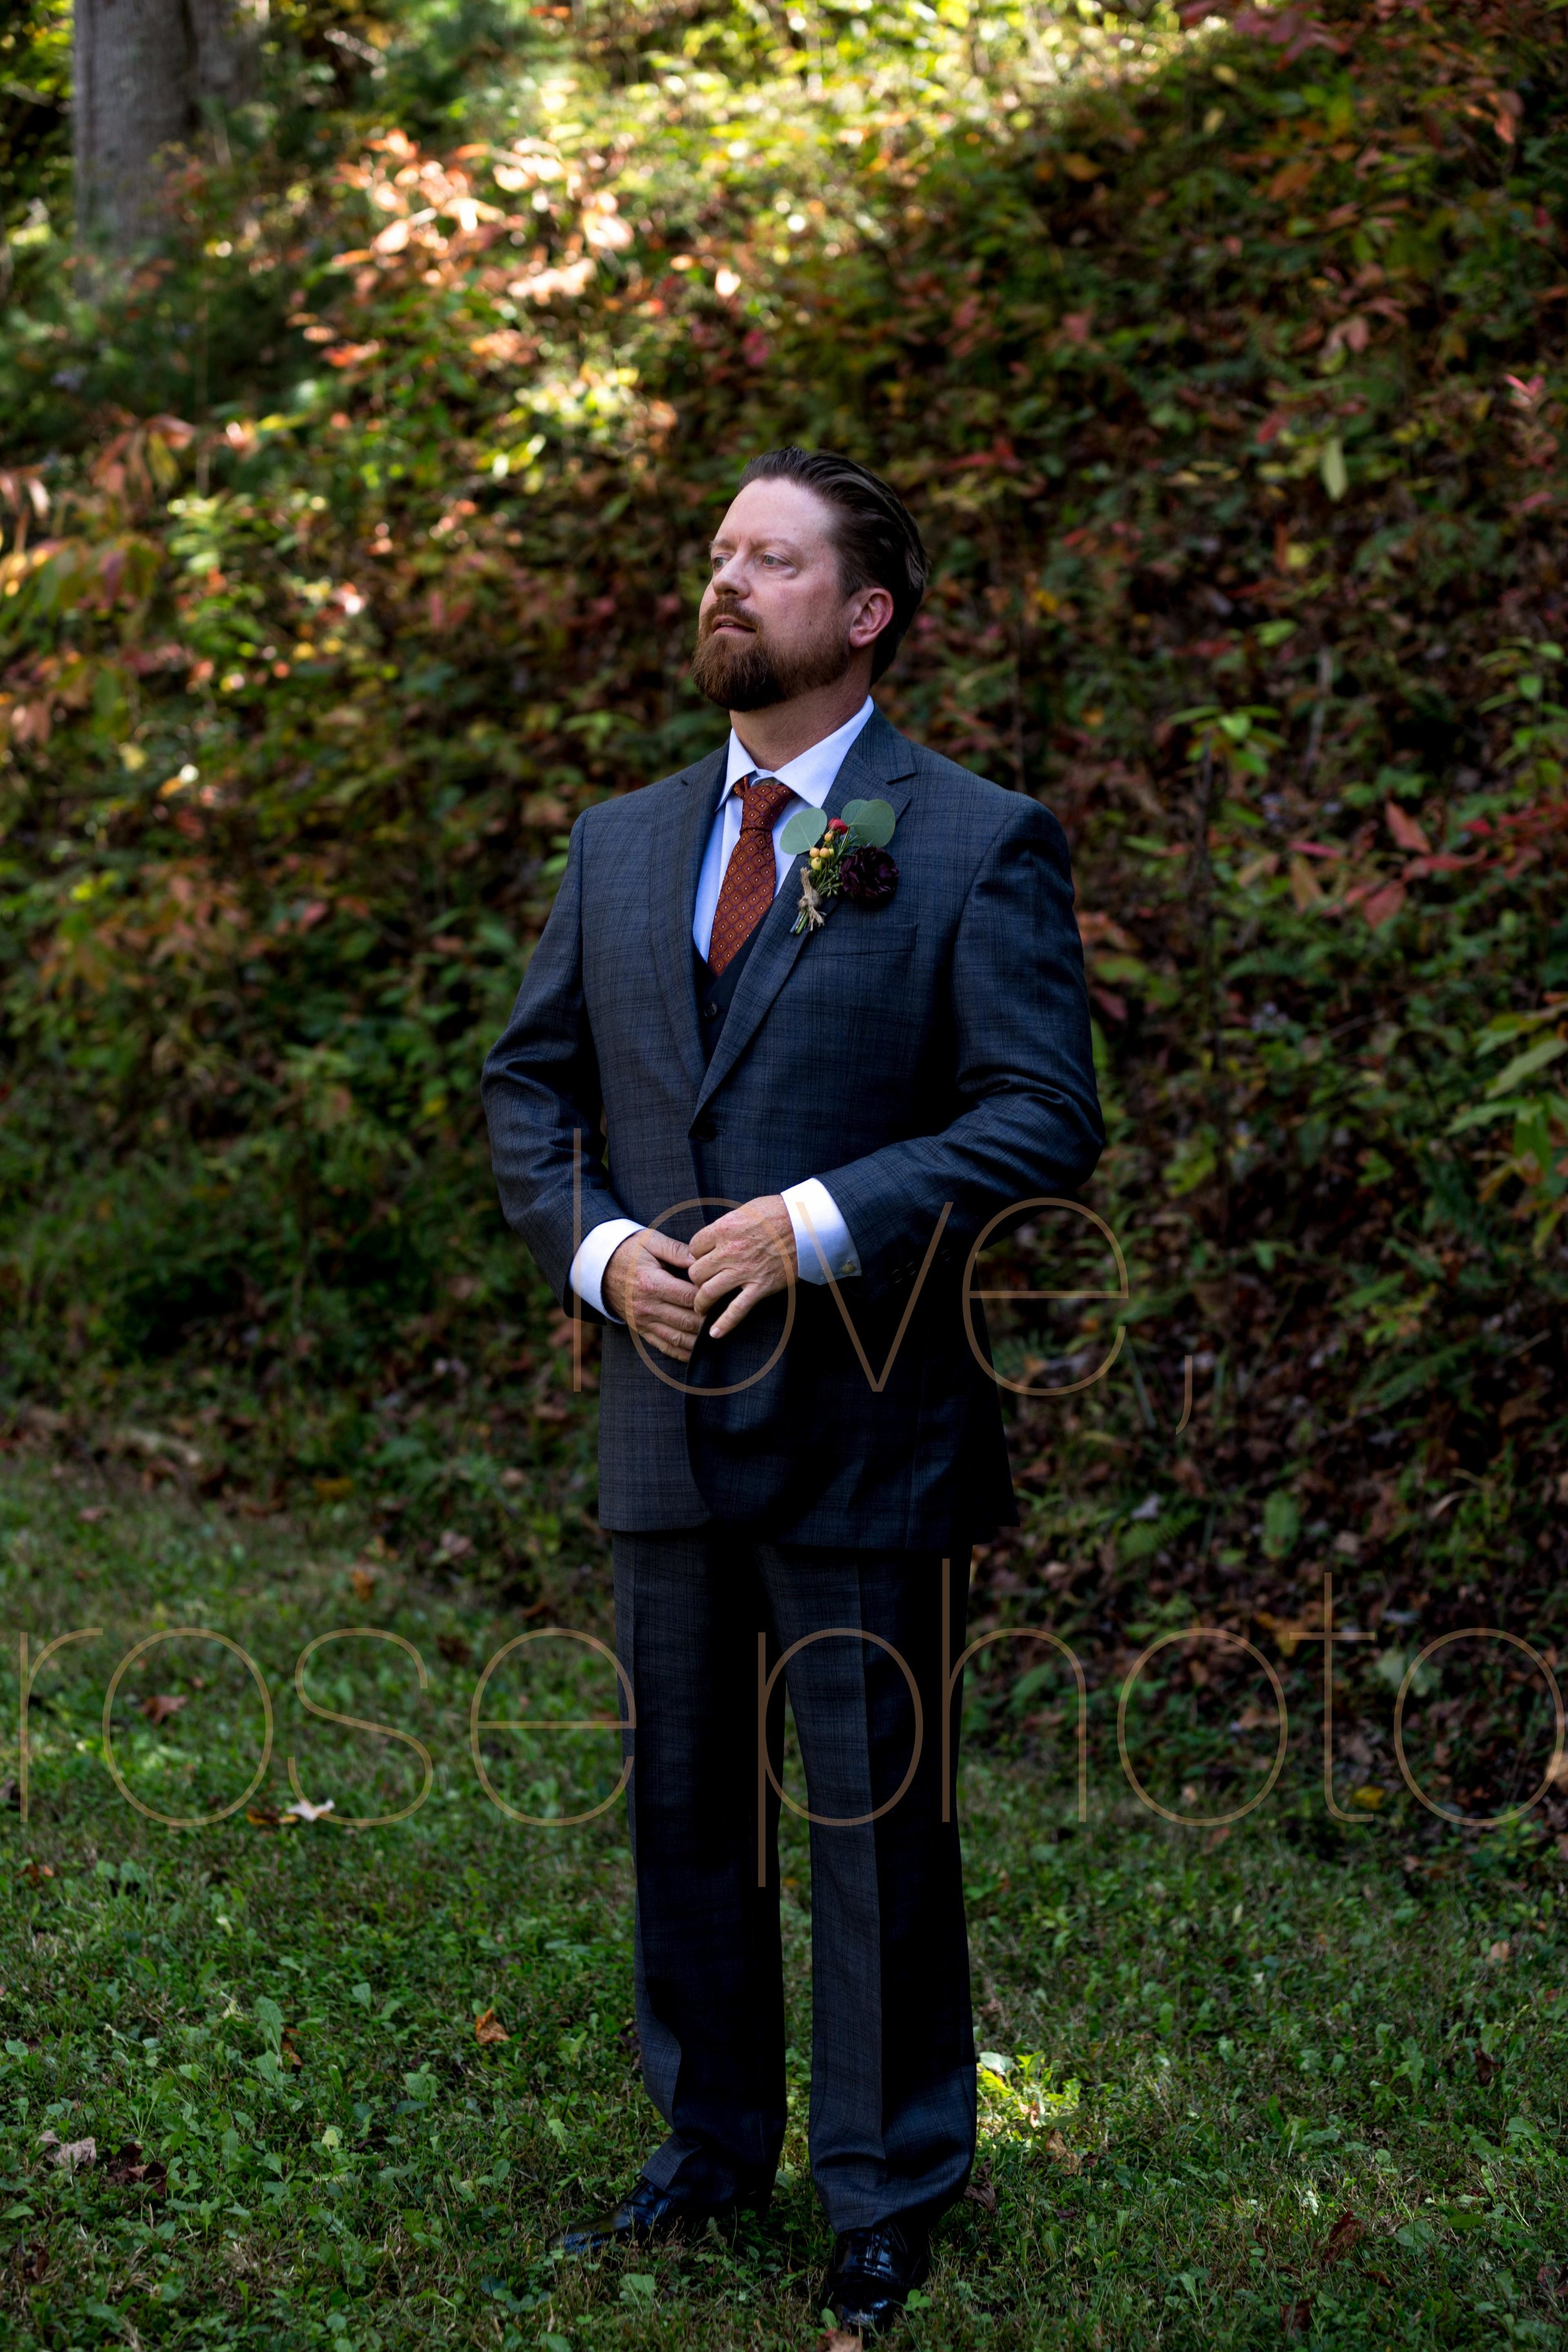 Jane Krame + Jason Ashevegas married asheville best wedding photographers -15.jpg